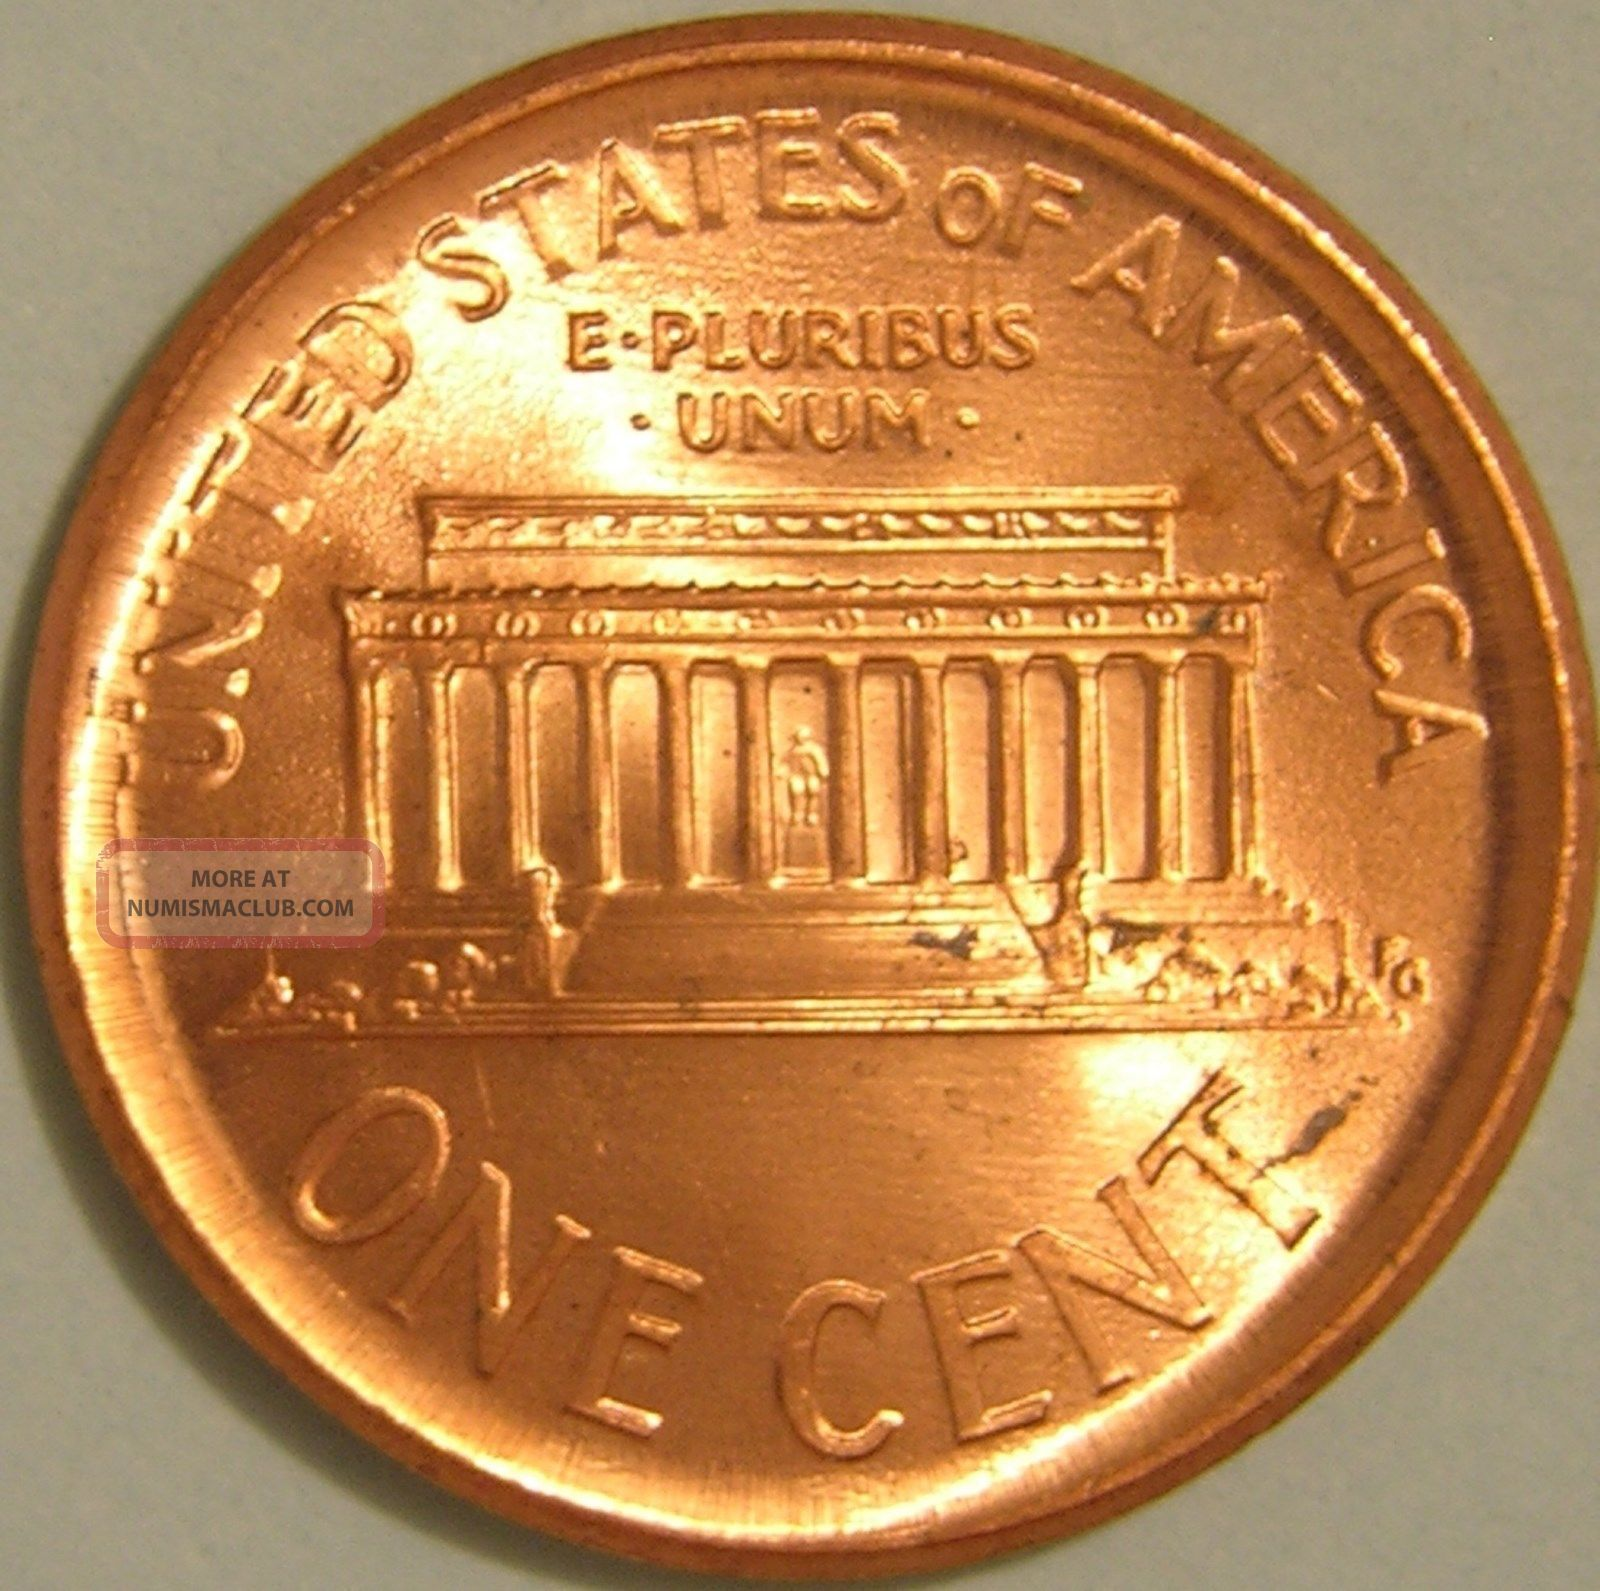 2001 P Lincoln Memorial Penny Broadstruck Error Coin